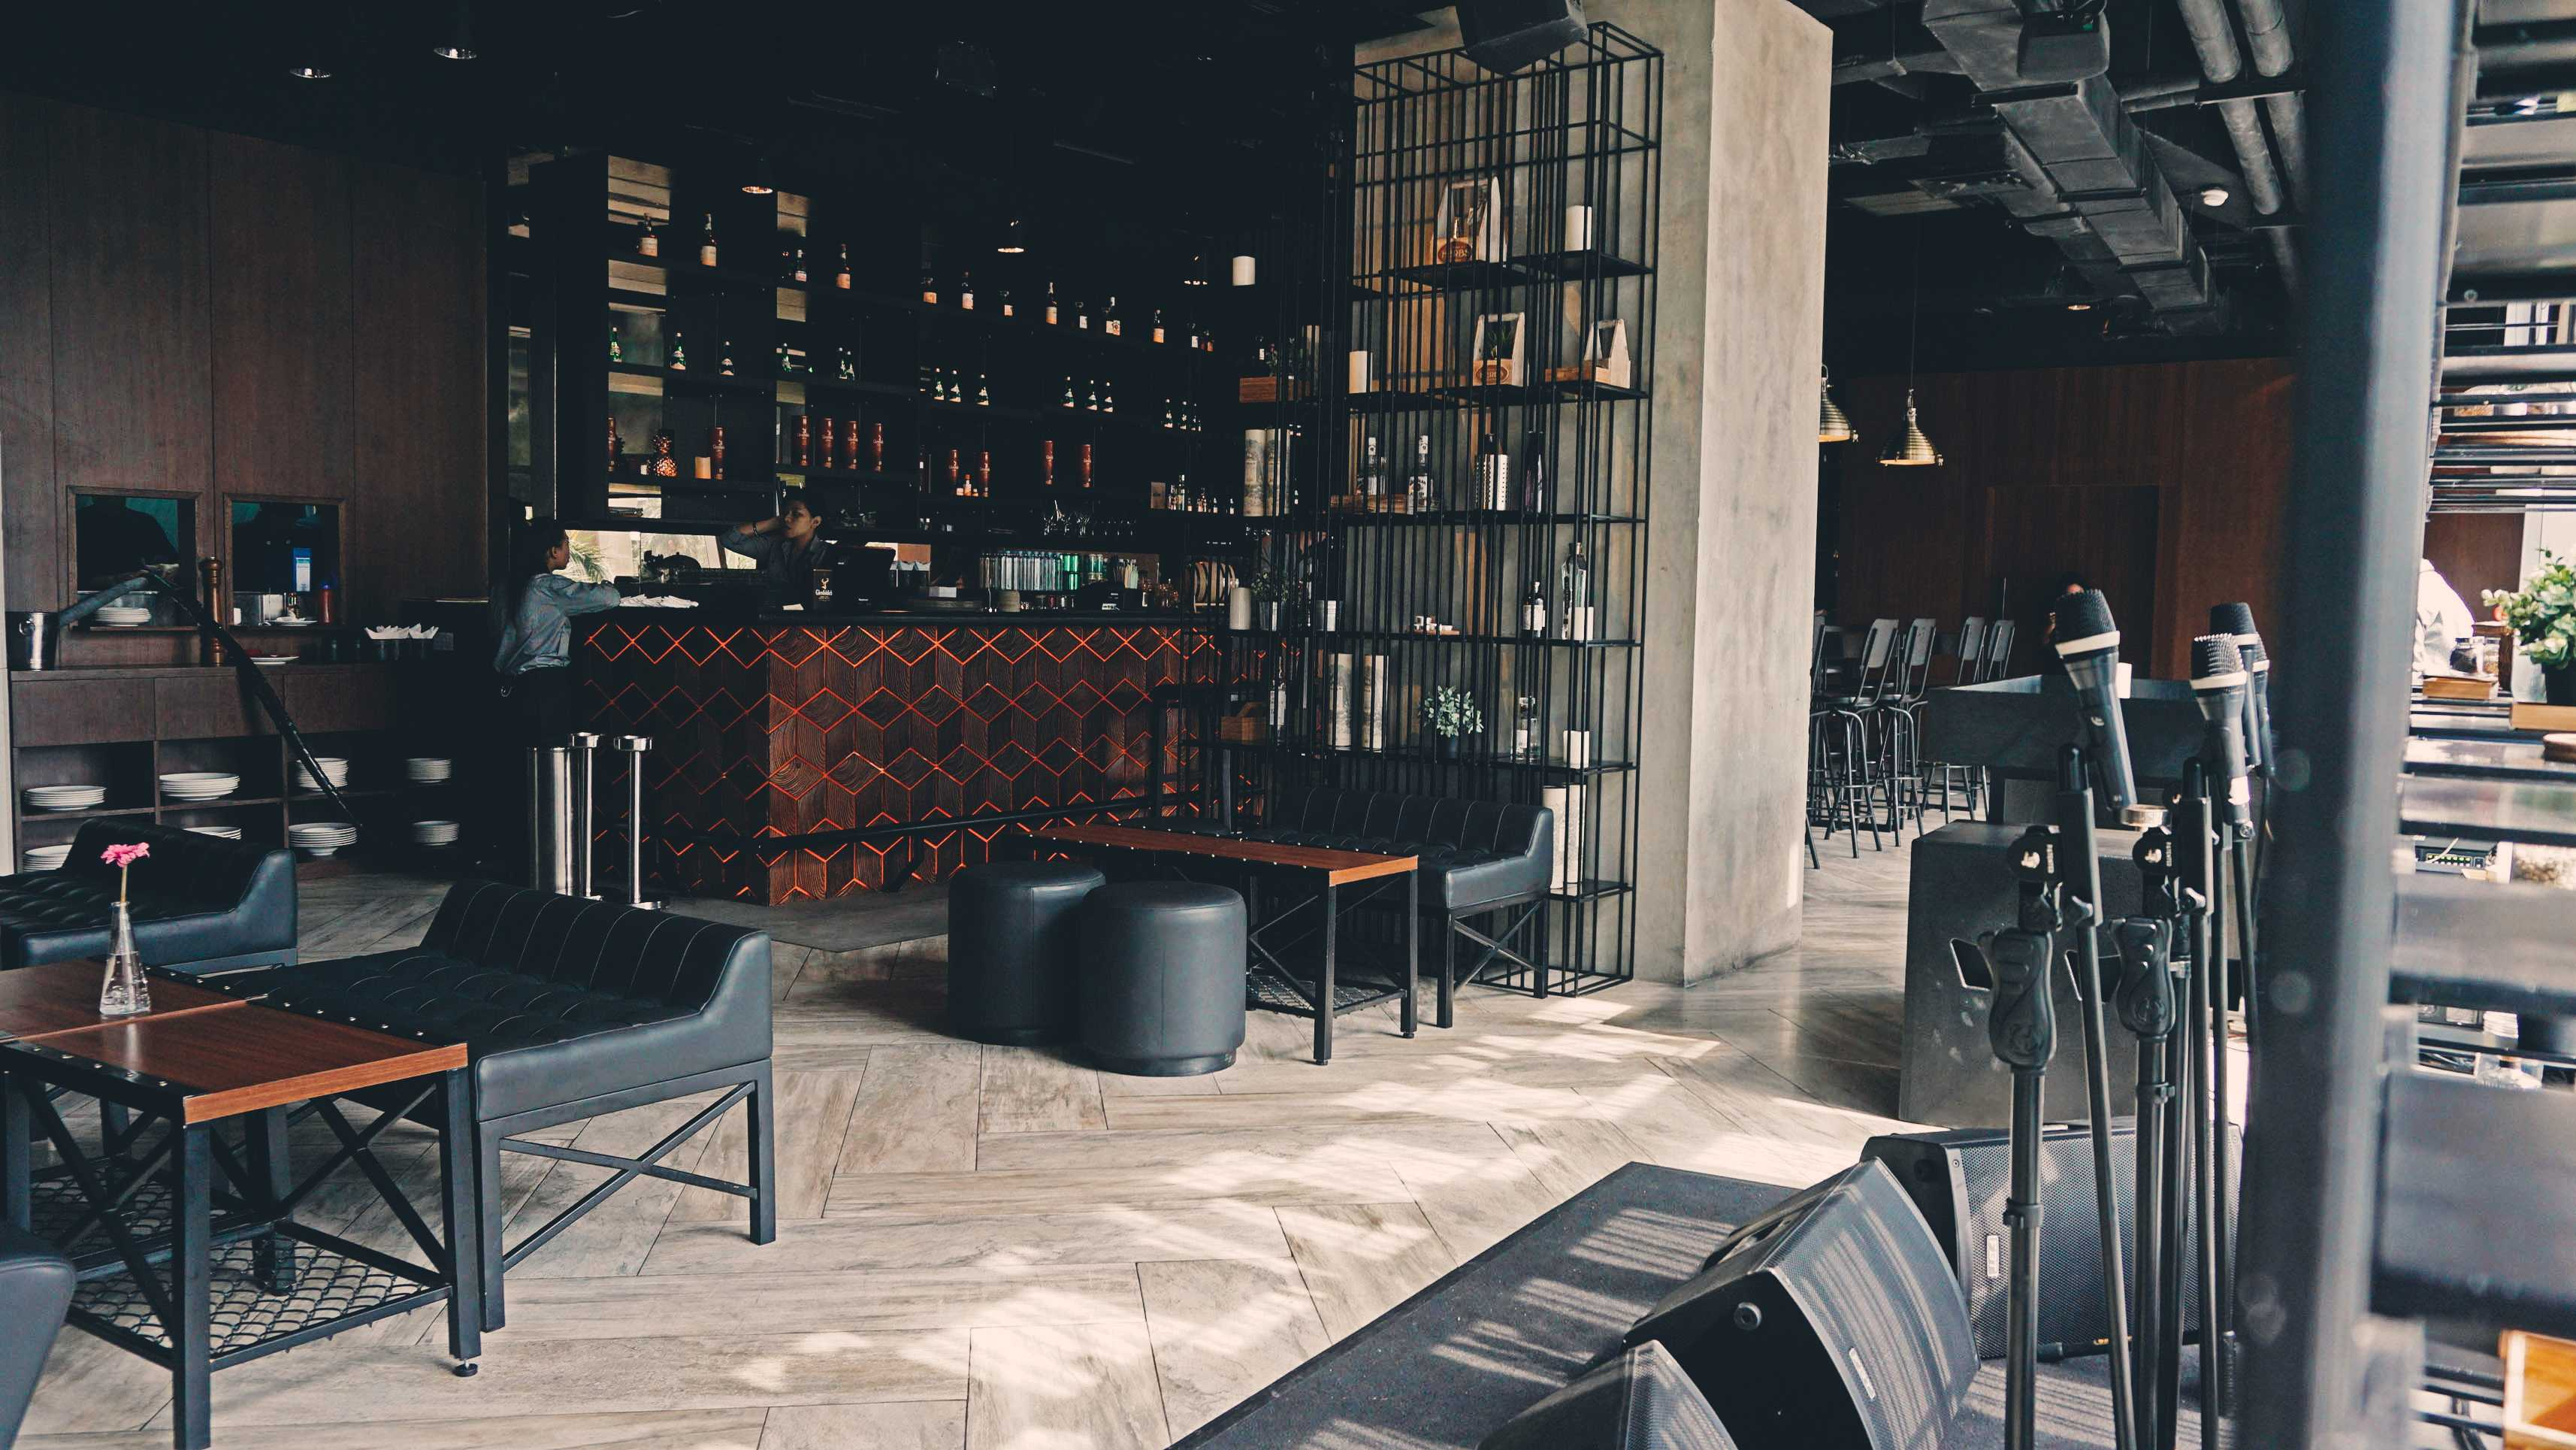 Gilang Kamajati 5 Elements Creation Architecture In Flow Bar & Lounge Cbd Mega Kuningan, Jl. Dr. Ide Anak Agung Gde Agung Kav 5.5 - 5.6, Setiabudi, Rt.5/rw.2, Kuningan Timur, Rt.5/rw.2, Kuningan Tim., Setia Budi, Kota Jakarta Selatan, Daerah Khusus Ibukota Jakarta 12950, Indonesia  2016-08-16-10   35756